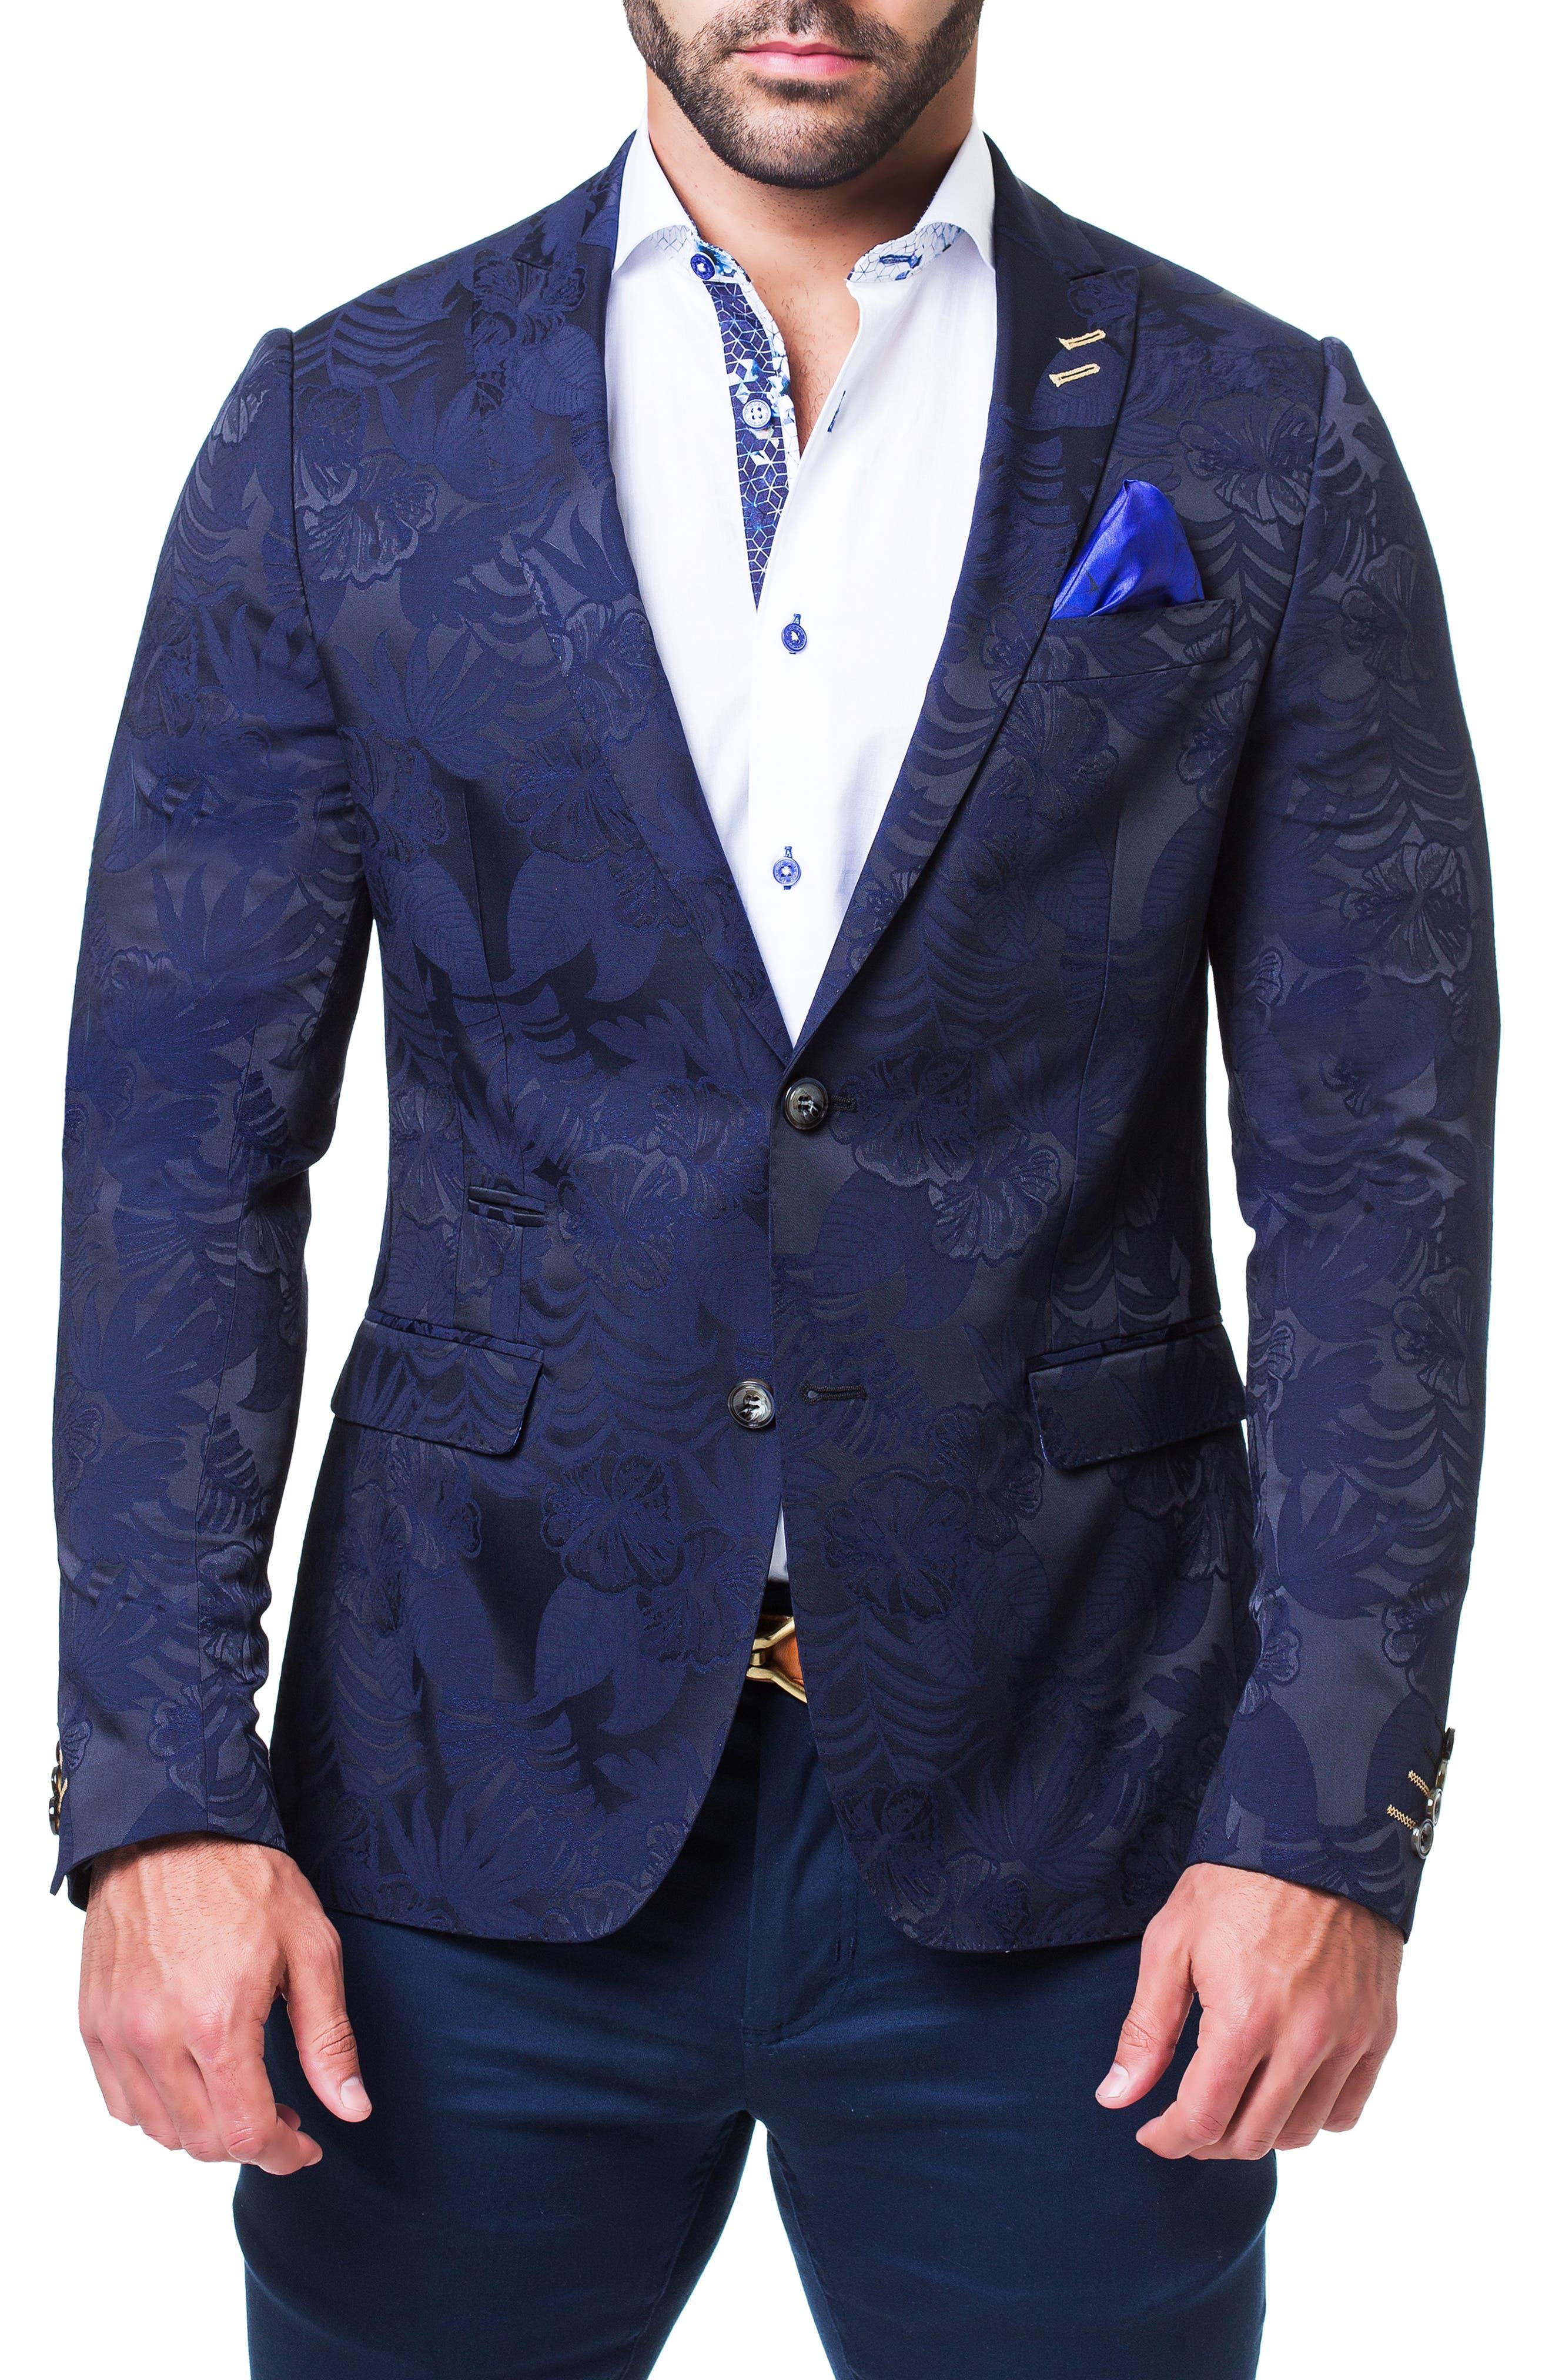 Descartes Field Blue Blazer,                         Main,                         color, BLUE